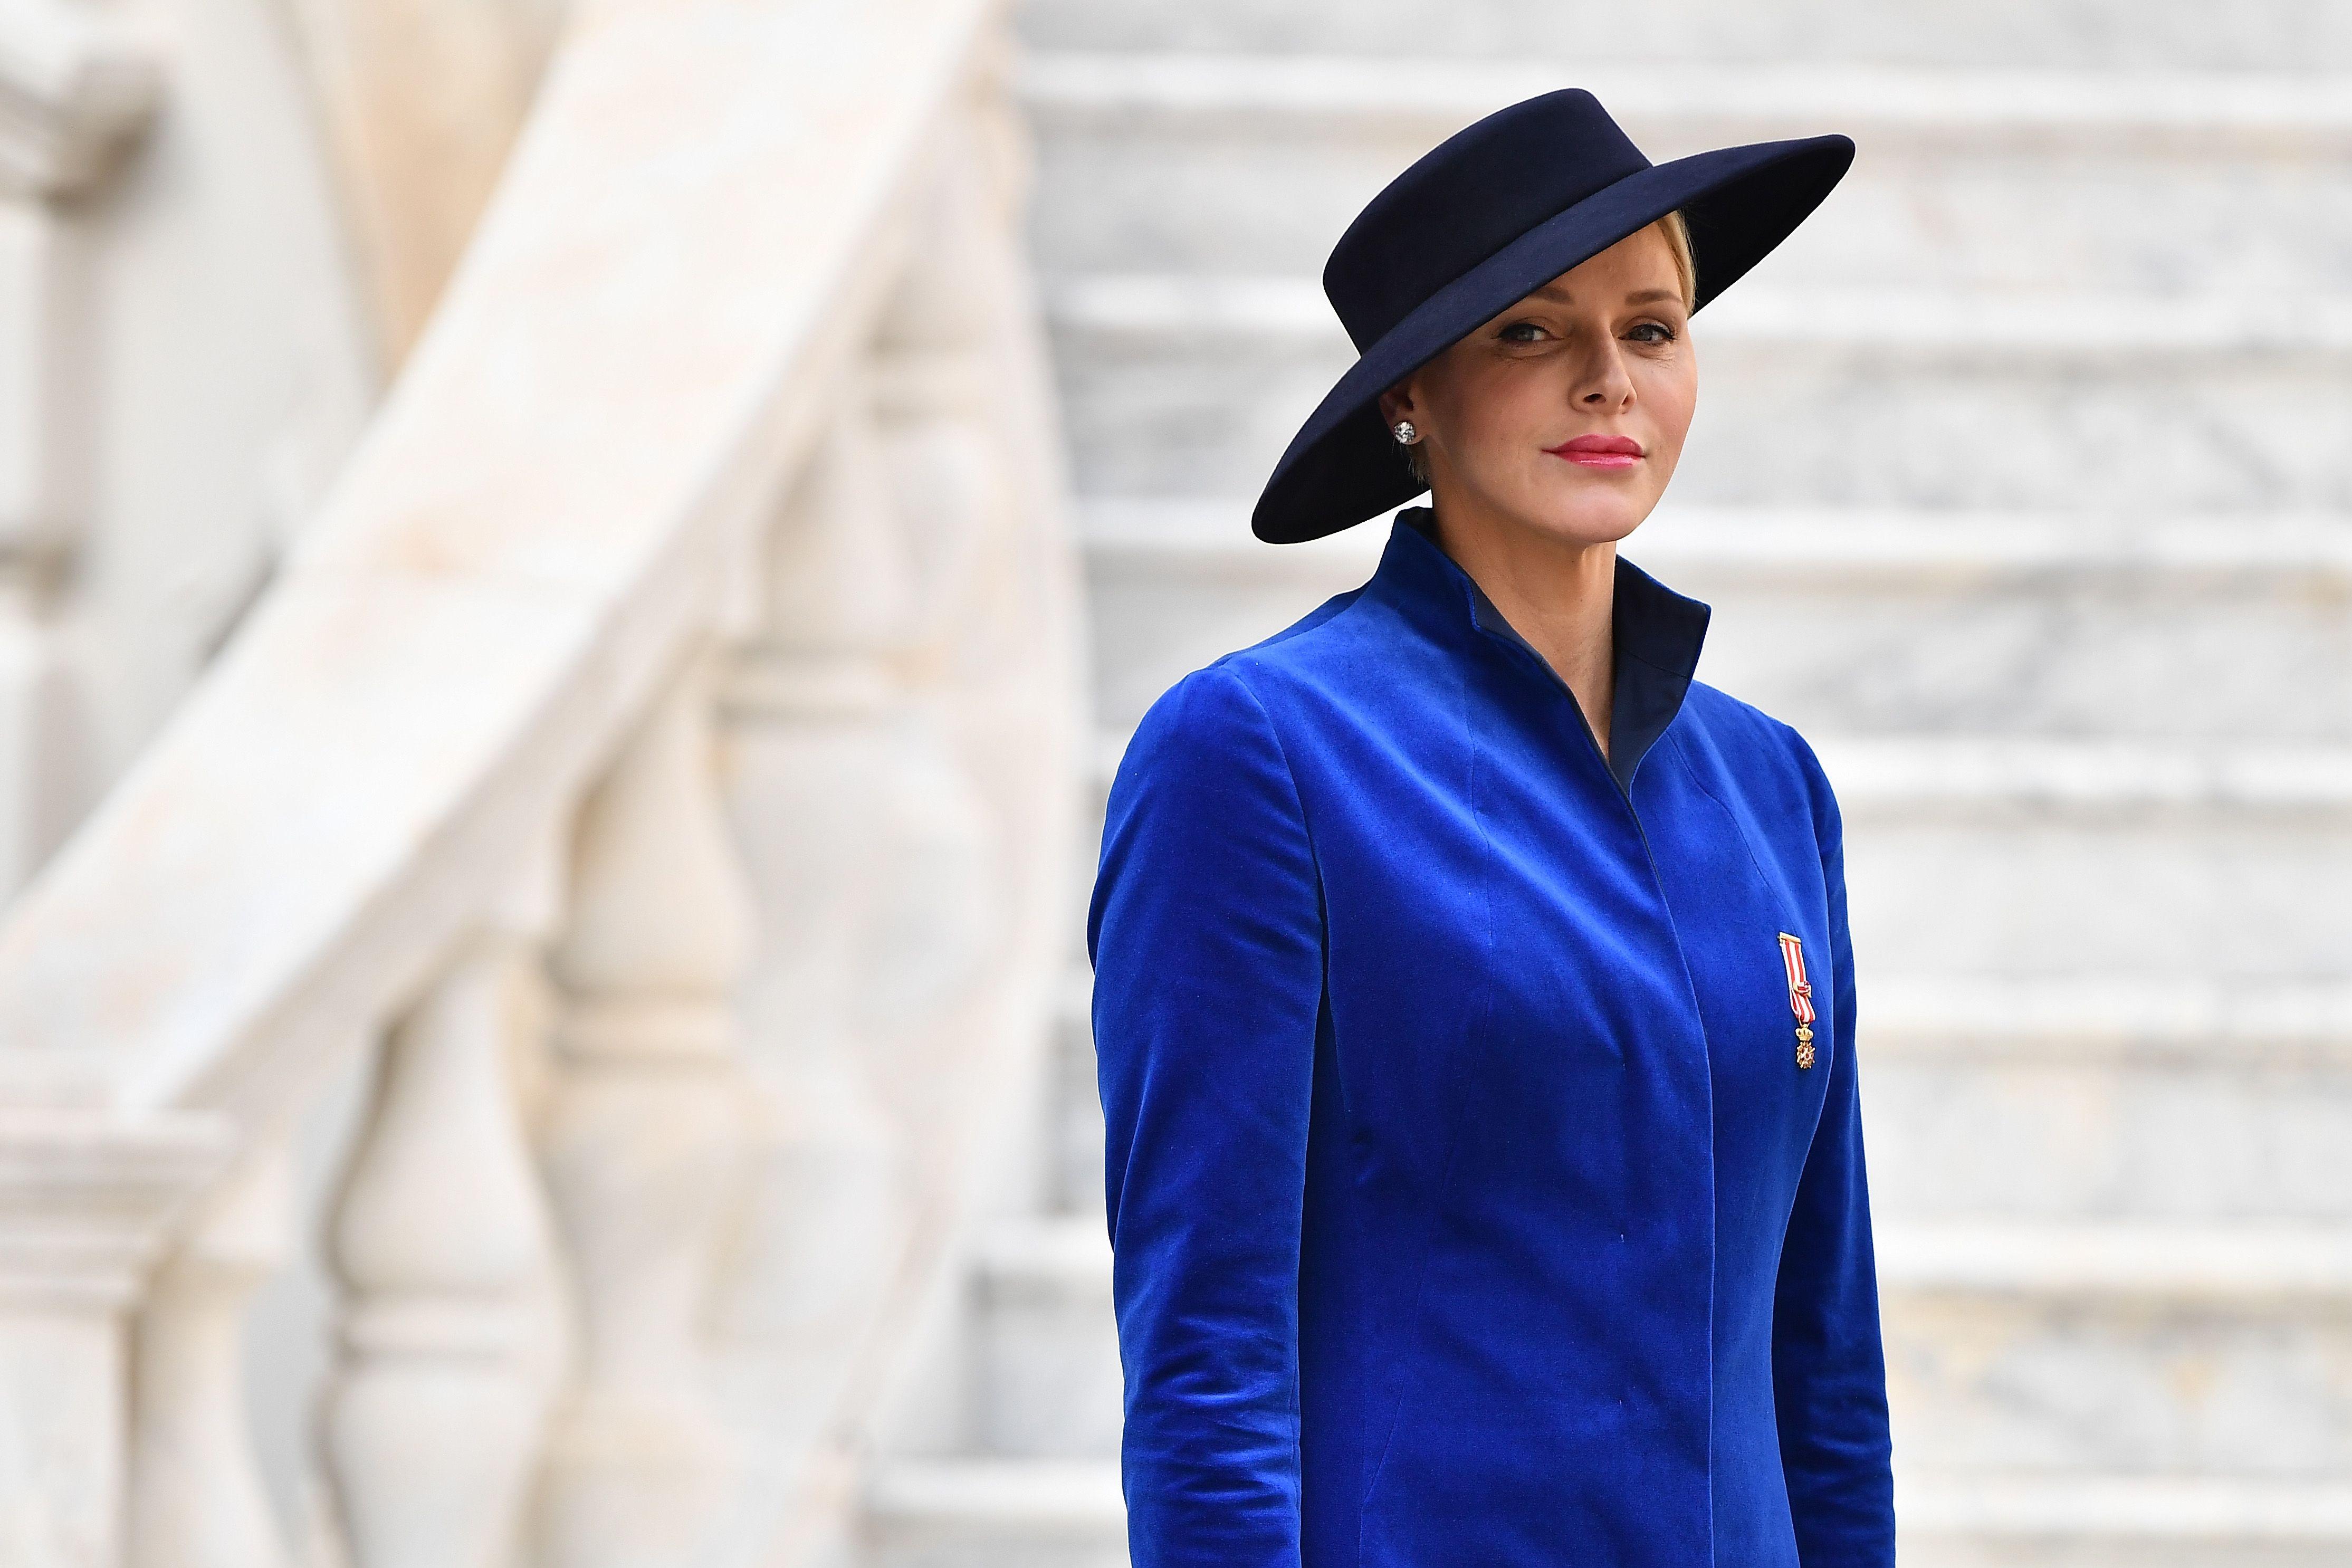 Princess Charlene of Monaco Has the Sexiest Wardrobe of Any Royal